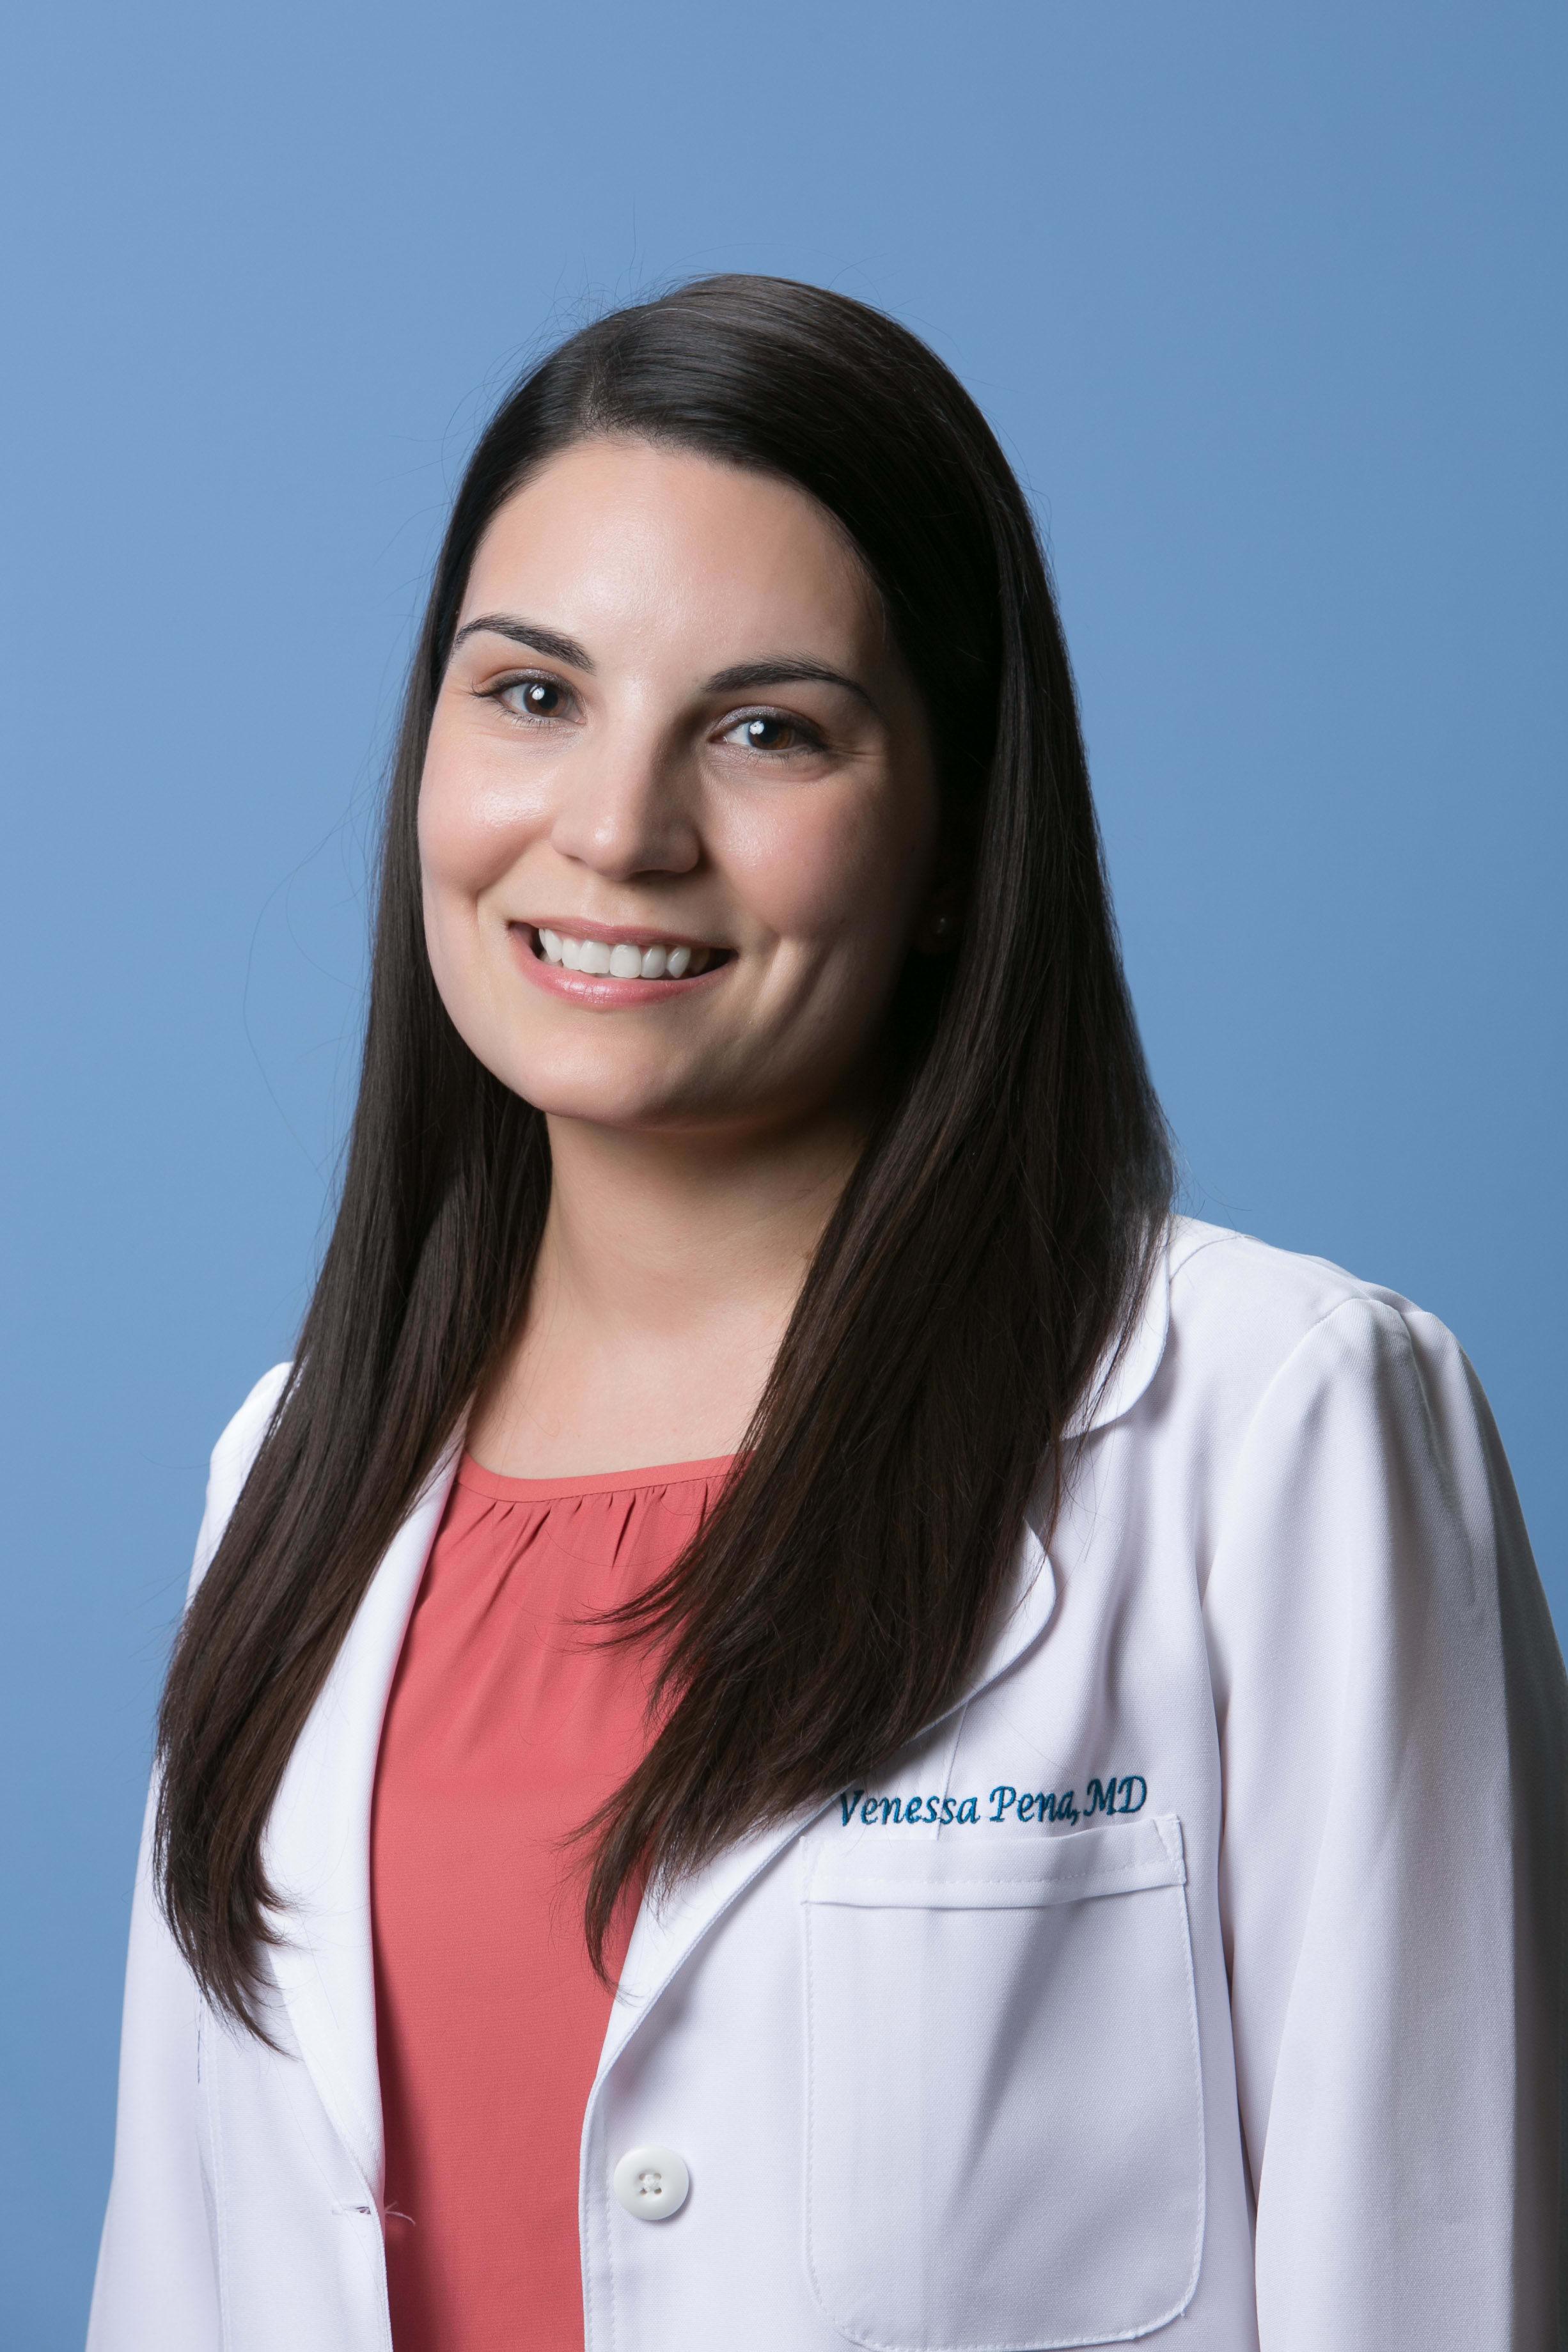 Dr. Venessa Pena-Robichaux MD